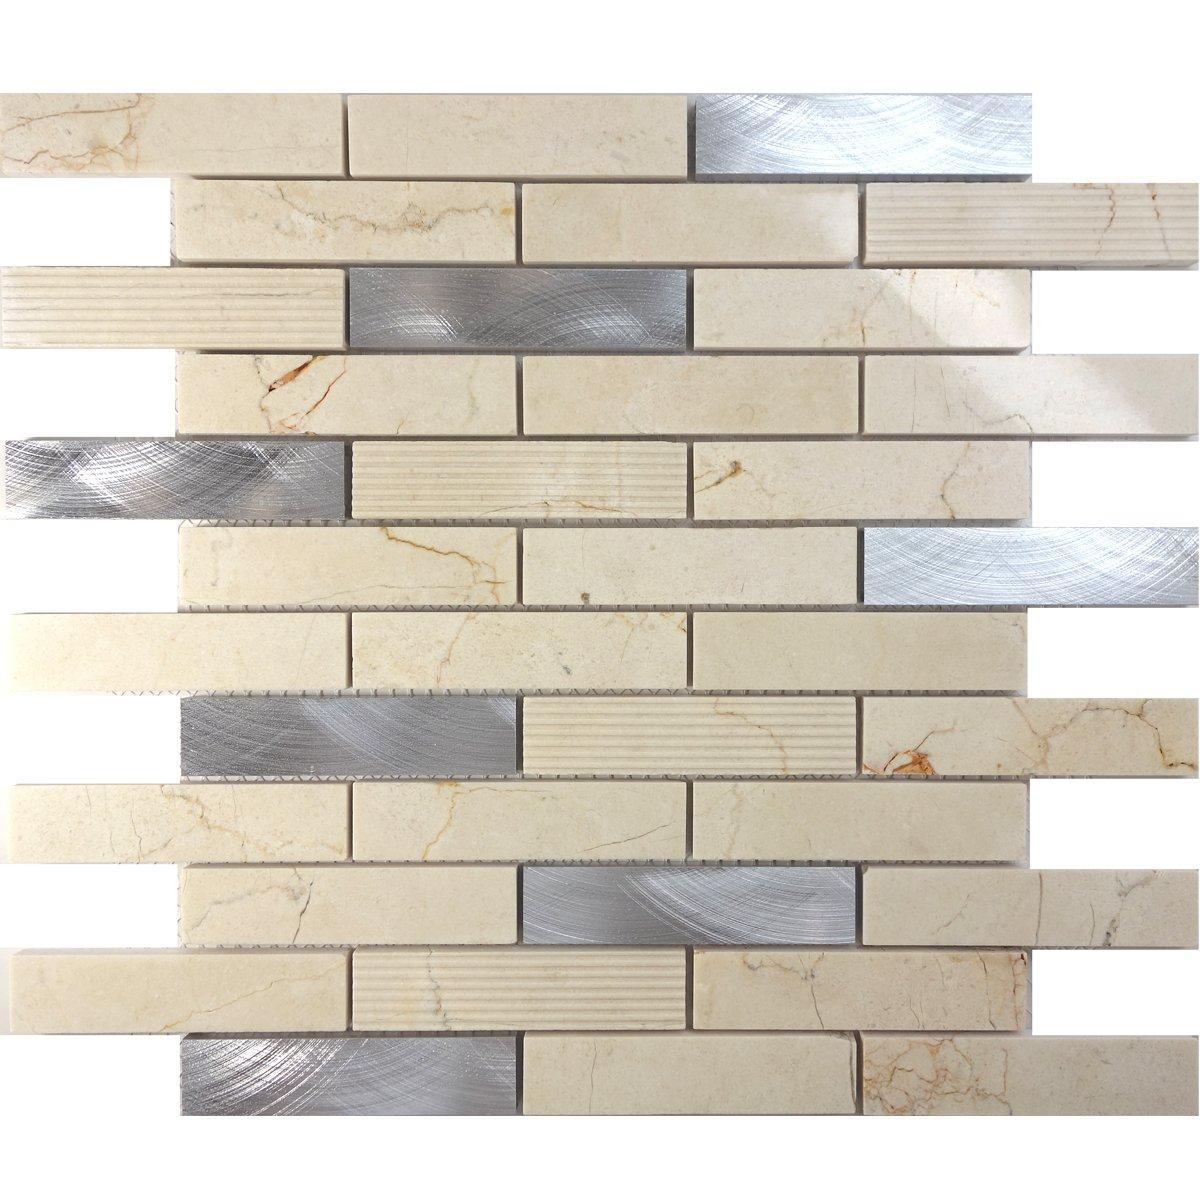 Modket TDH206MO Cream Beige Crema Marfil Marble Stone Metallic Aluminum Brick Joint Pattern Mosaic Tile Backsplash